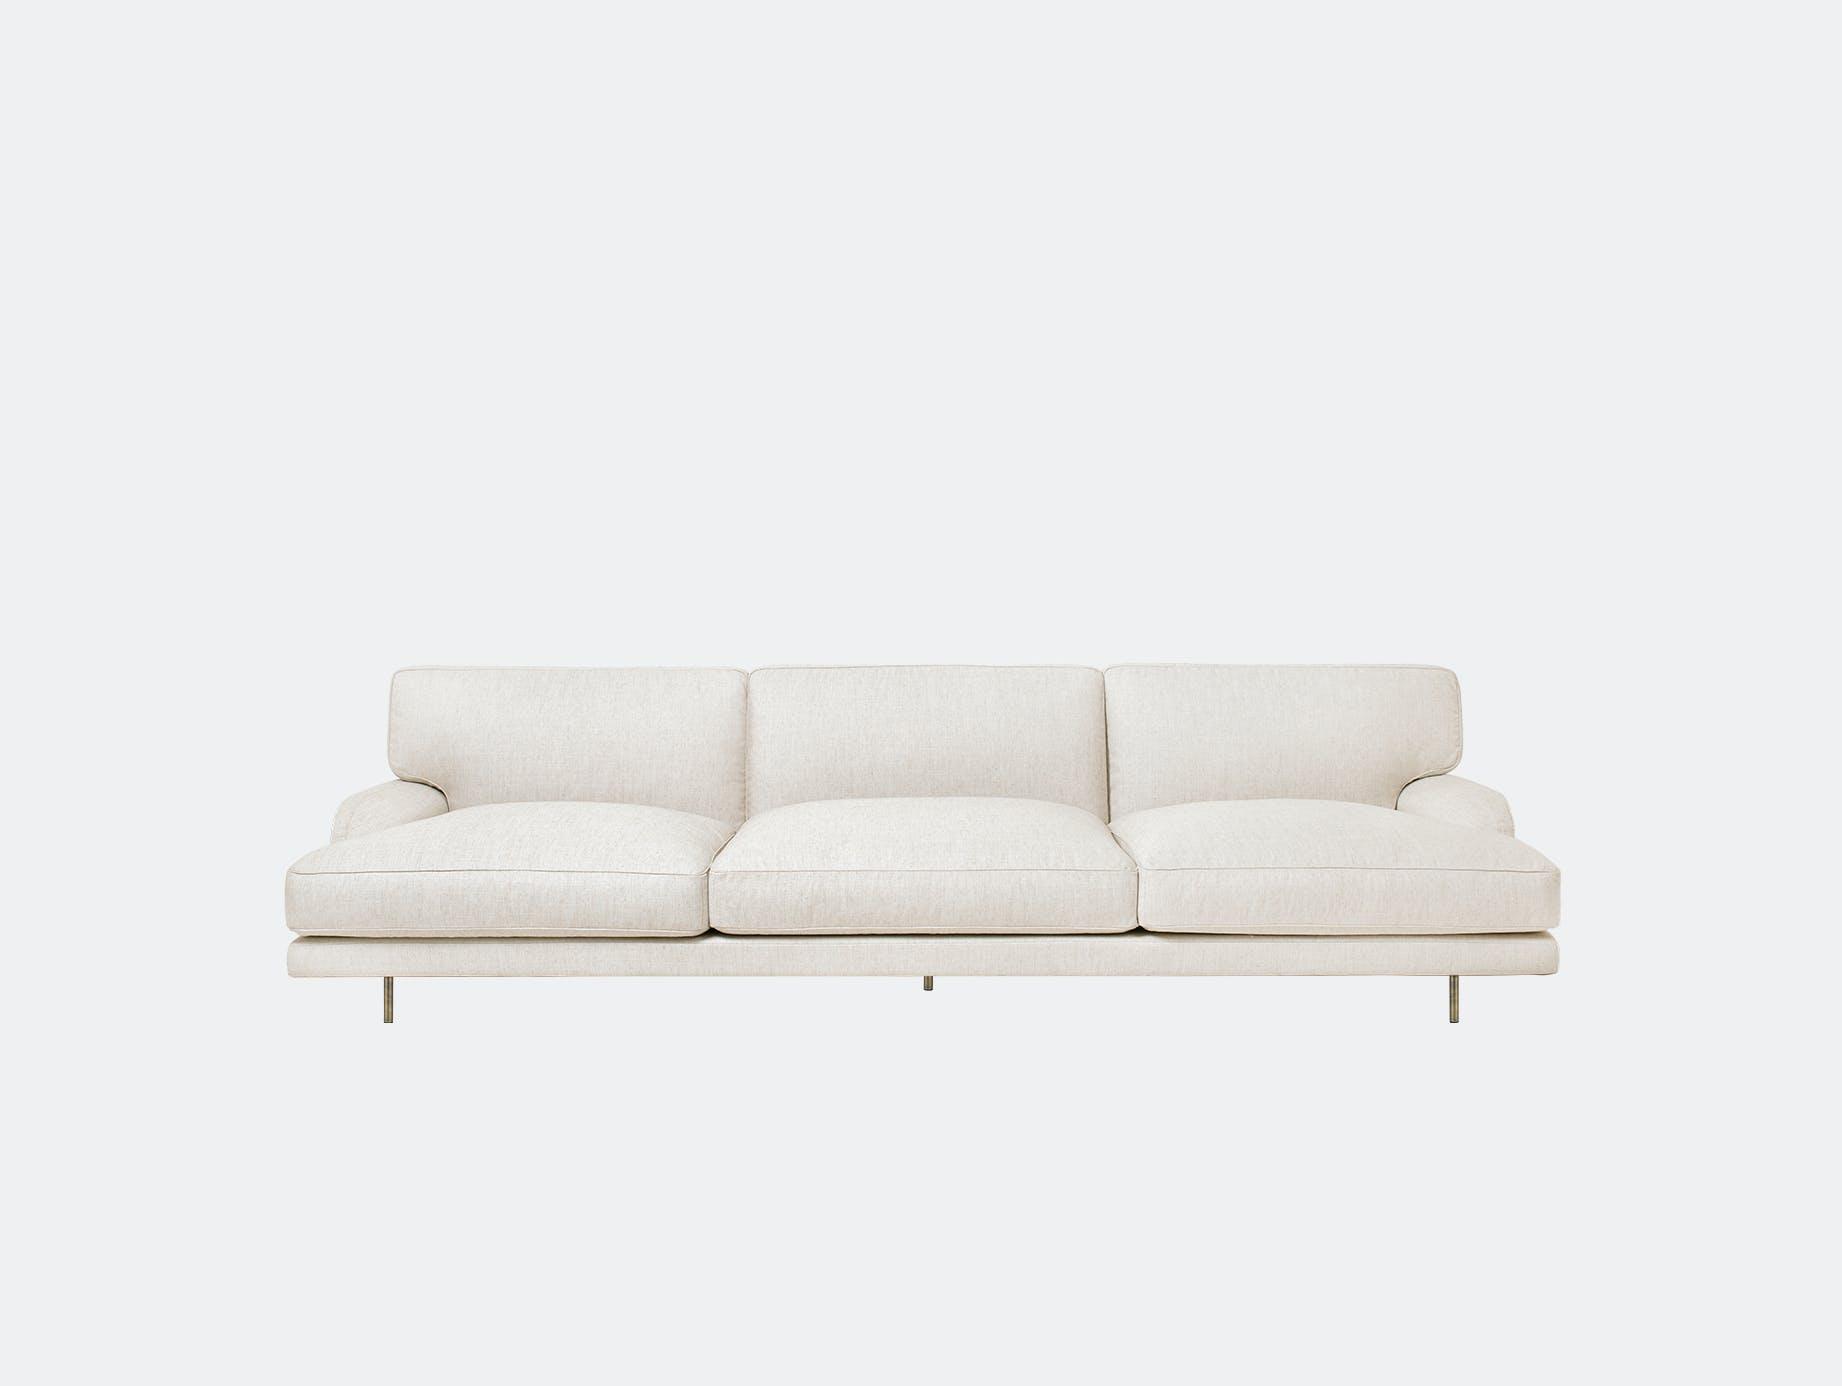 Gubi flaneur 3 seat sofa chambray 024